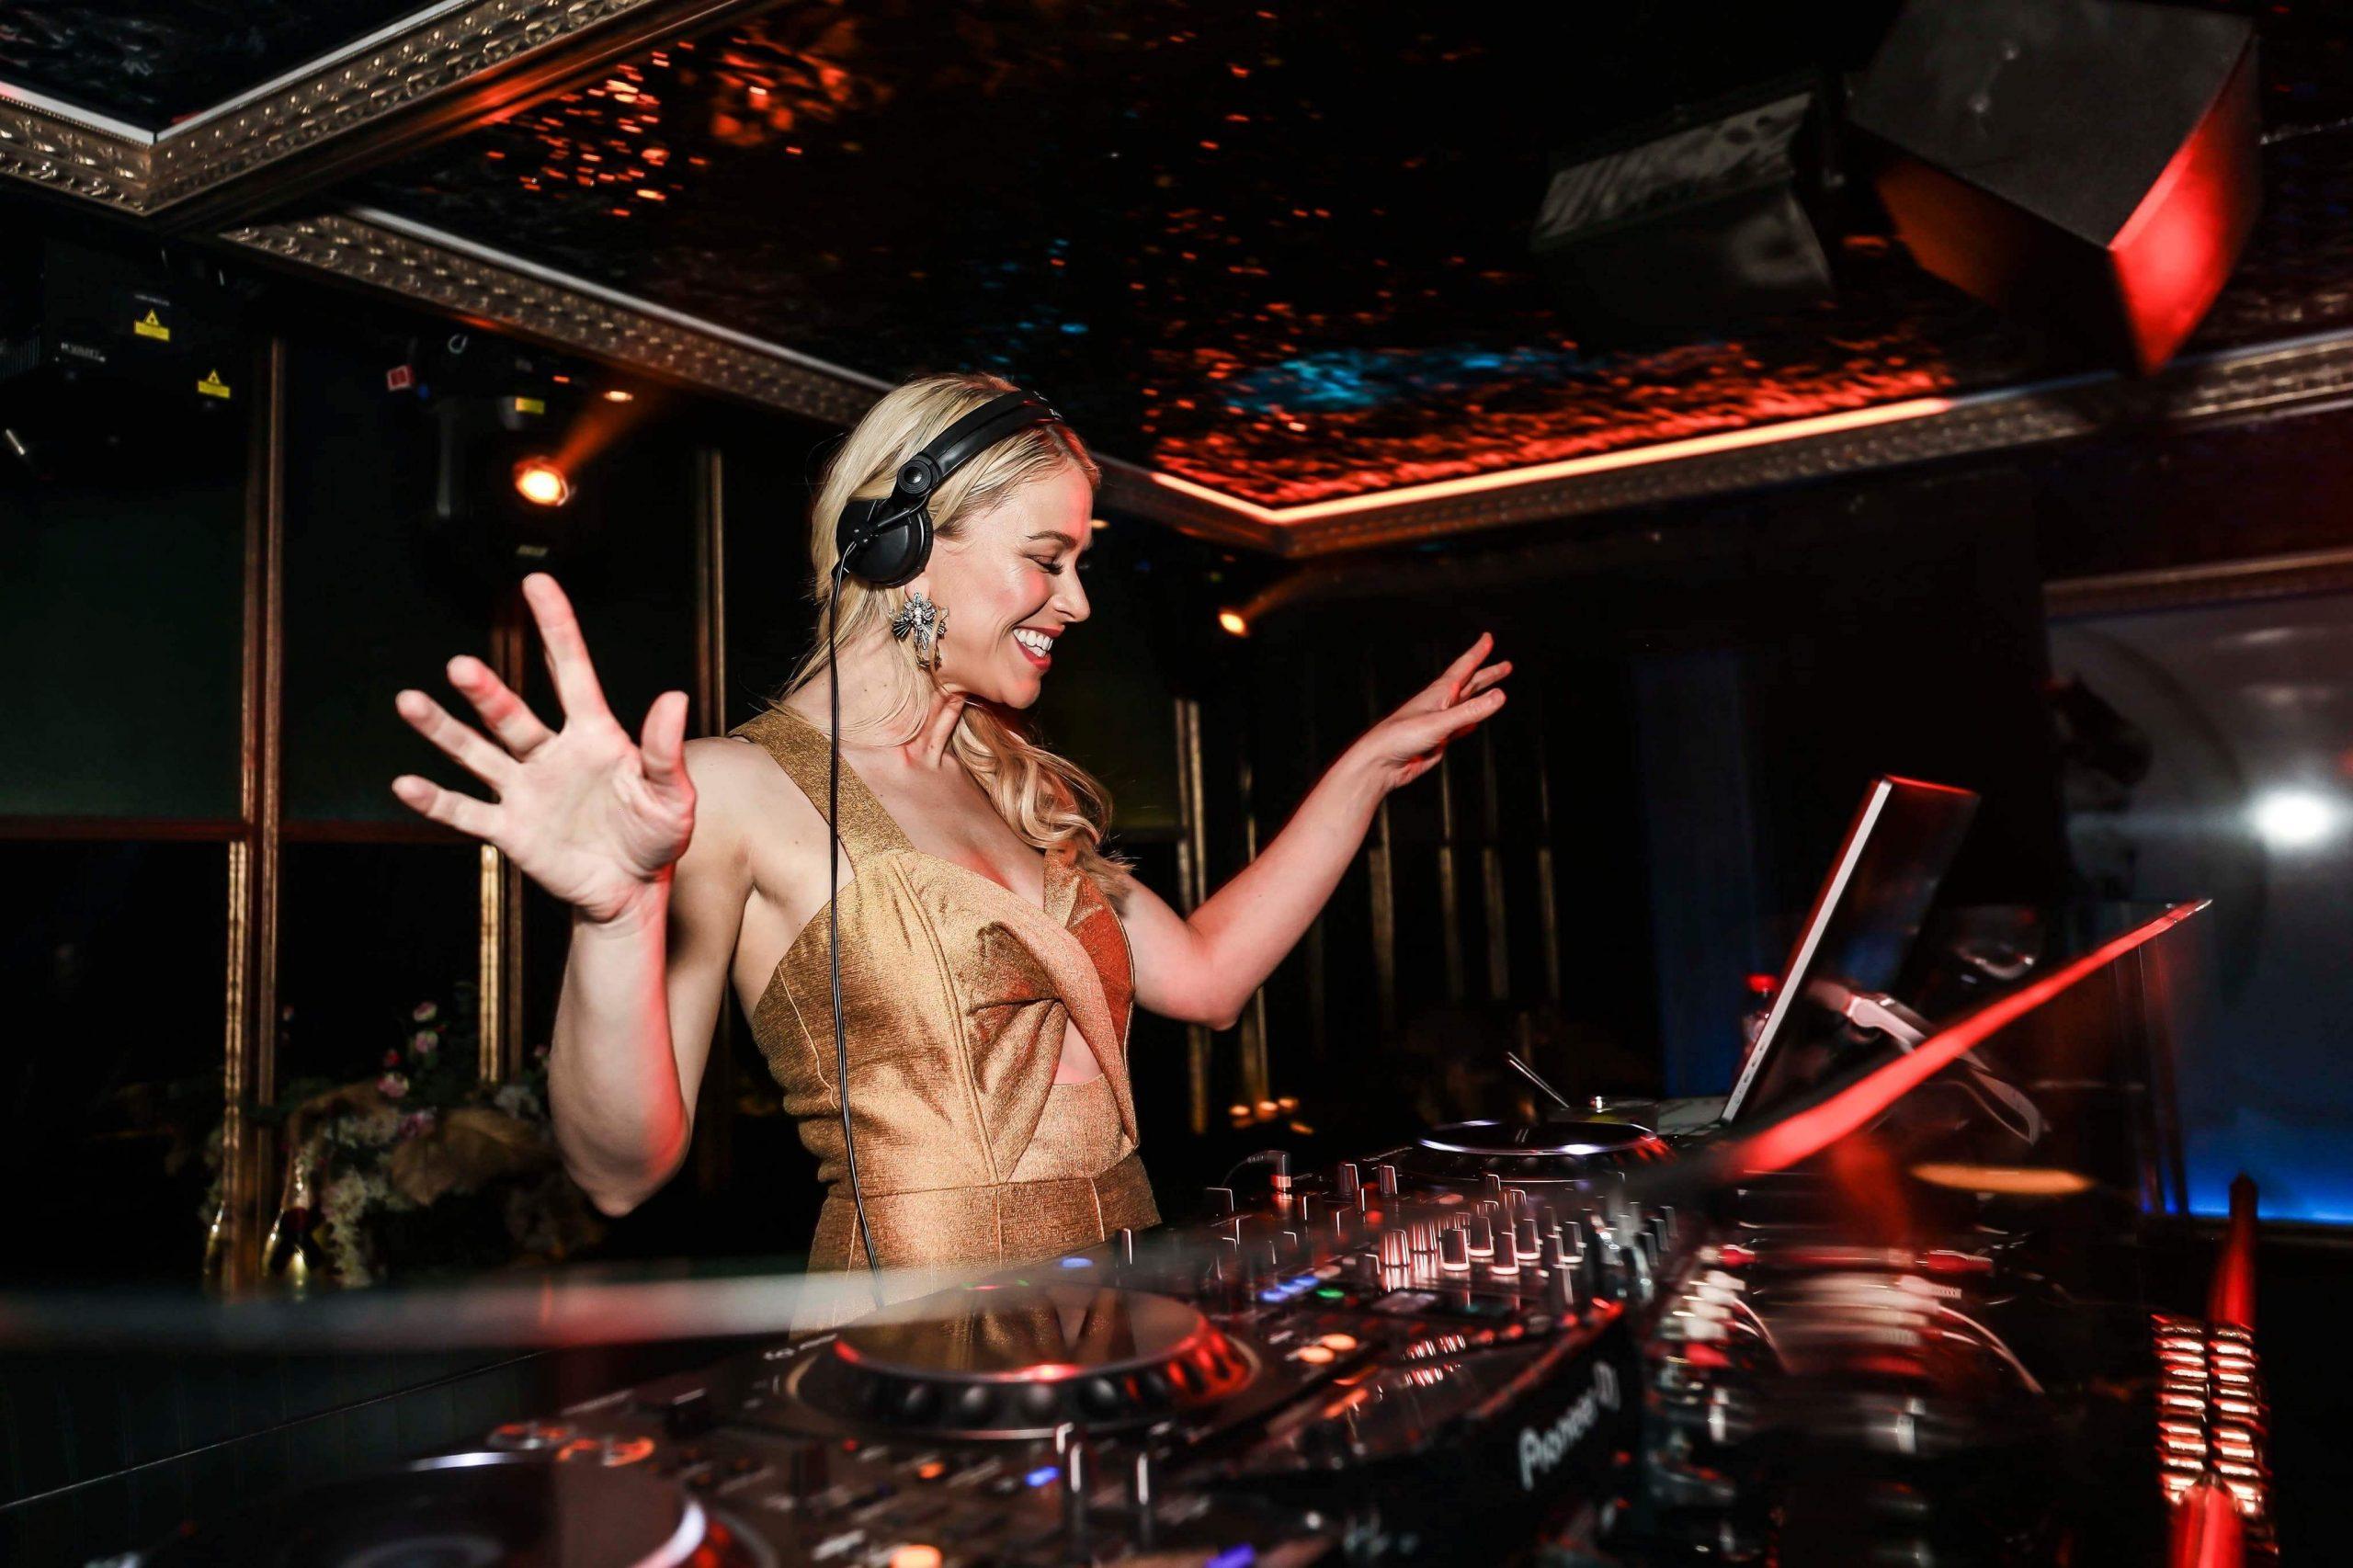 DJ Emma Behind Decks At Event